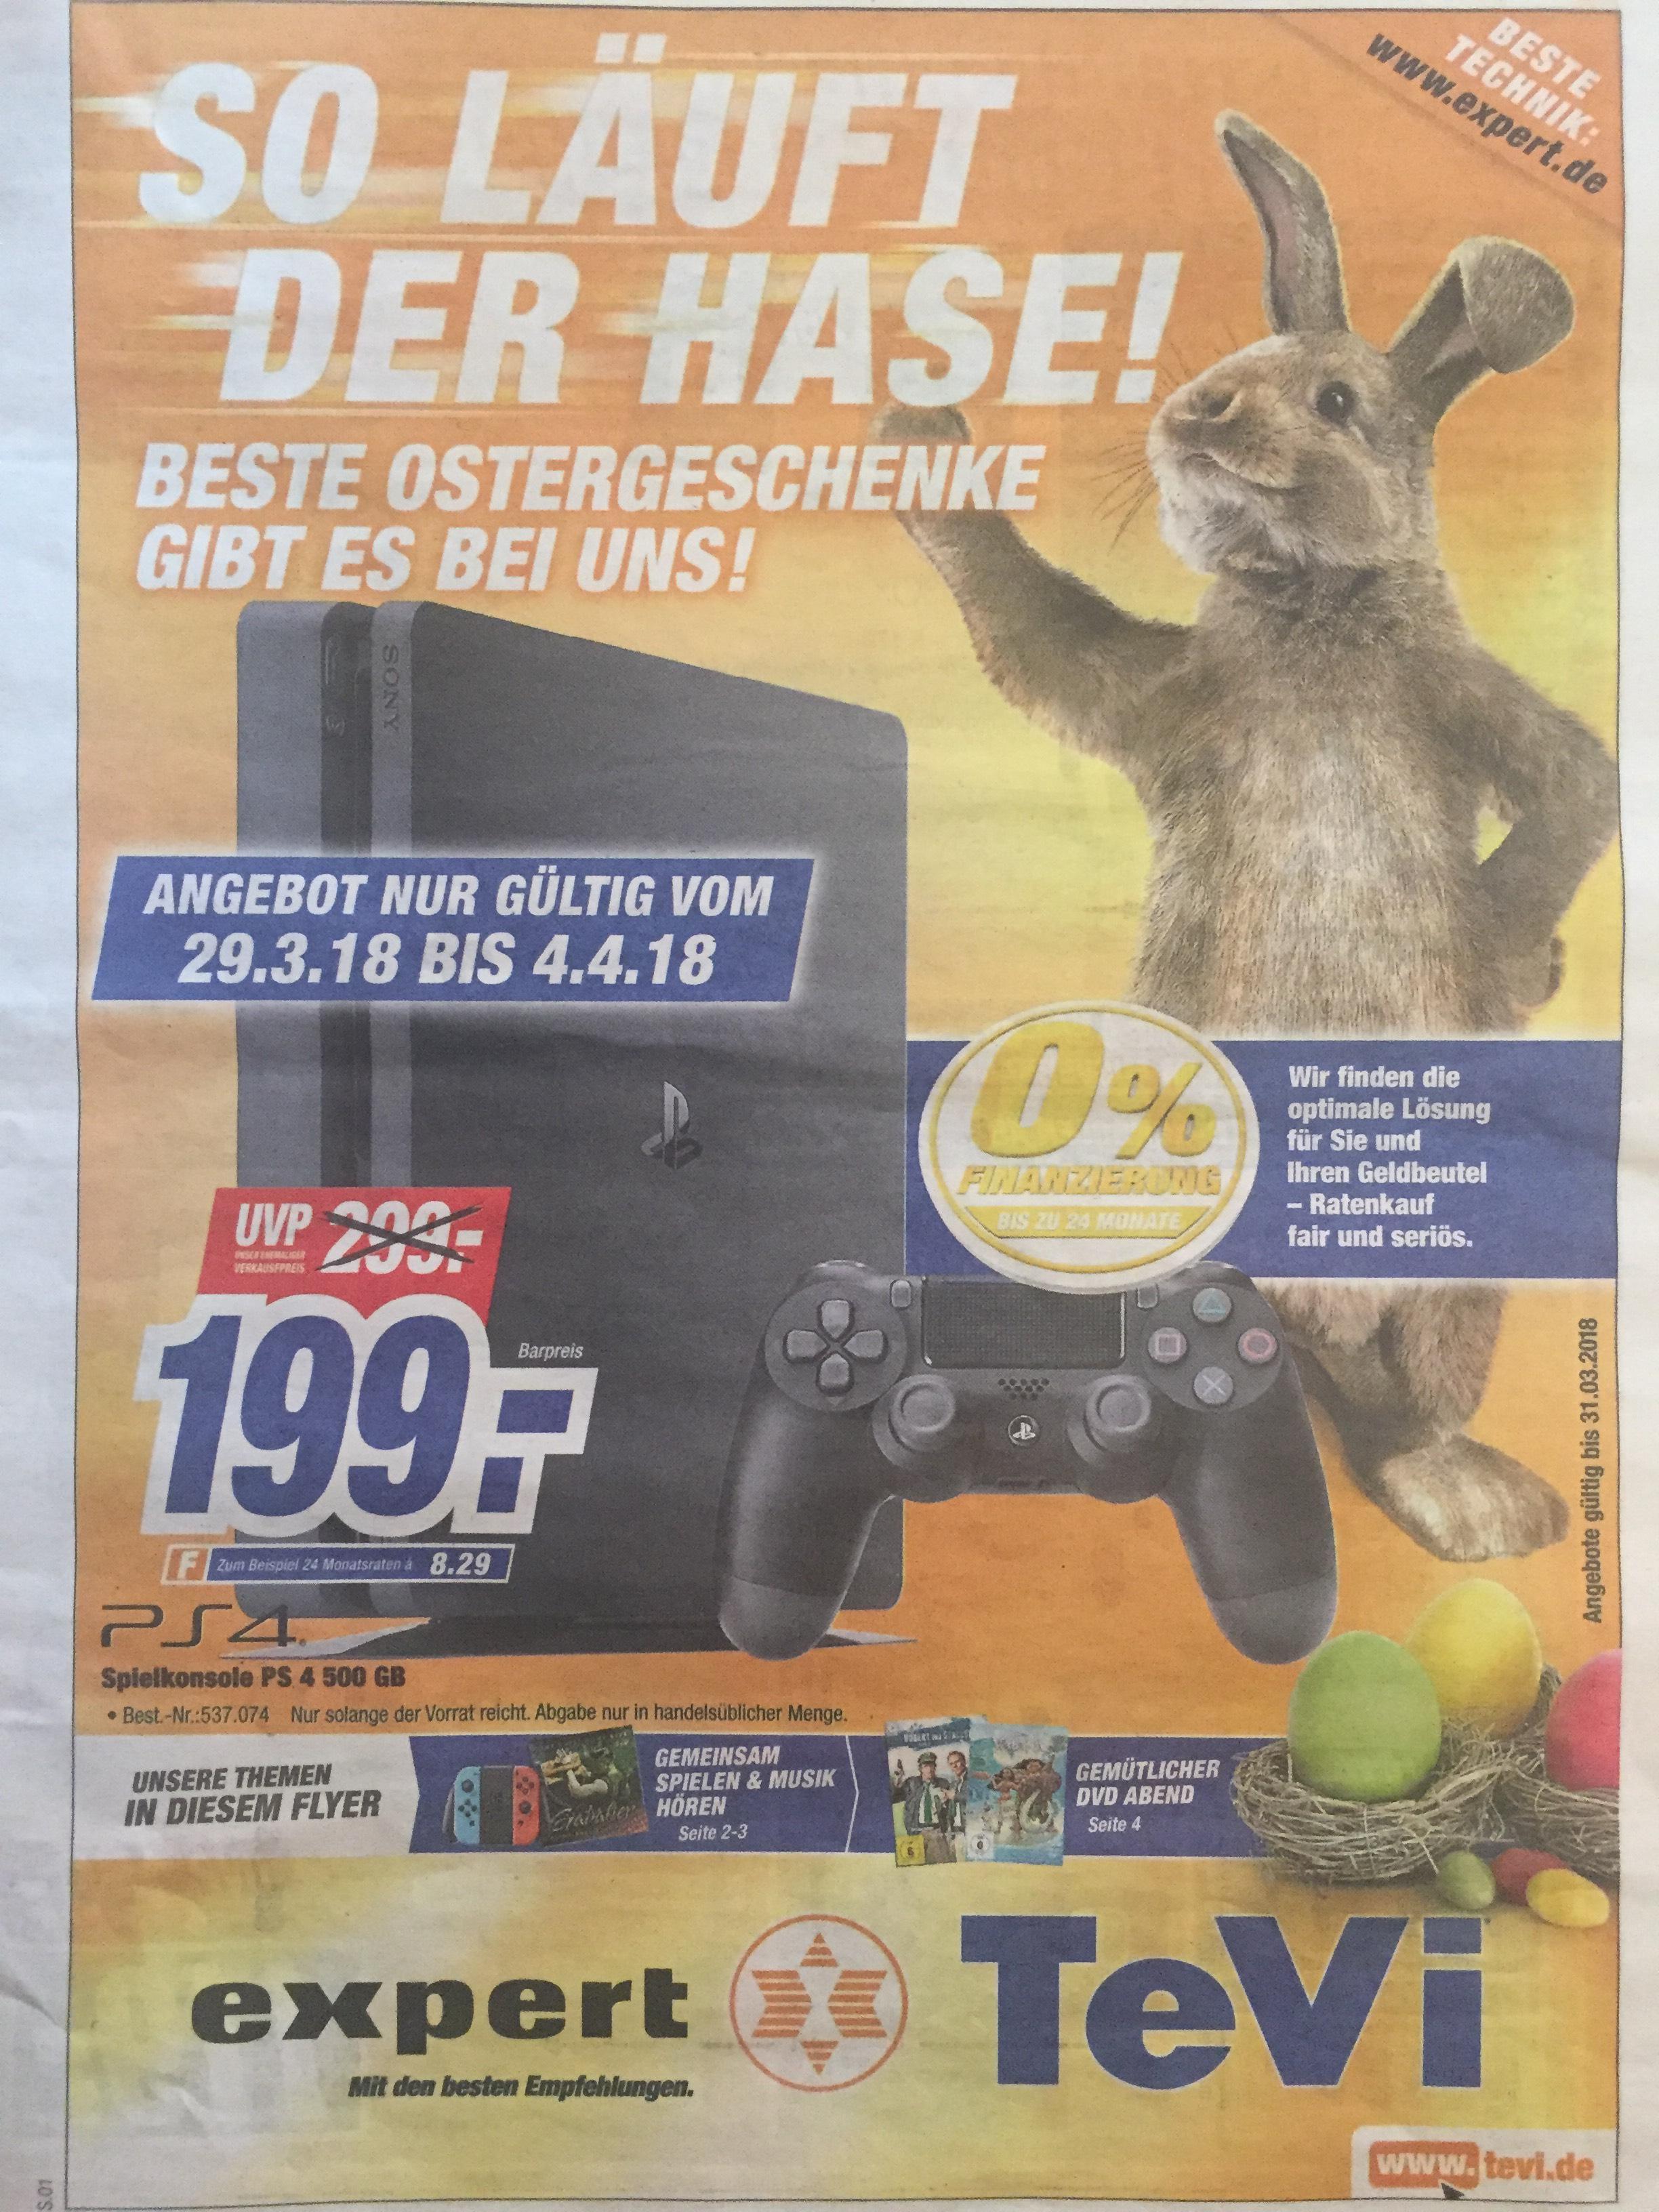 (evtl. Bundesweite Aktion) Sony PlayStation 4 (PS4) 500 GB (TeVi Neumarkt i.d.Oberpfalz)